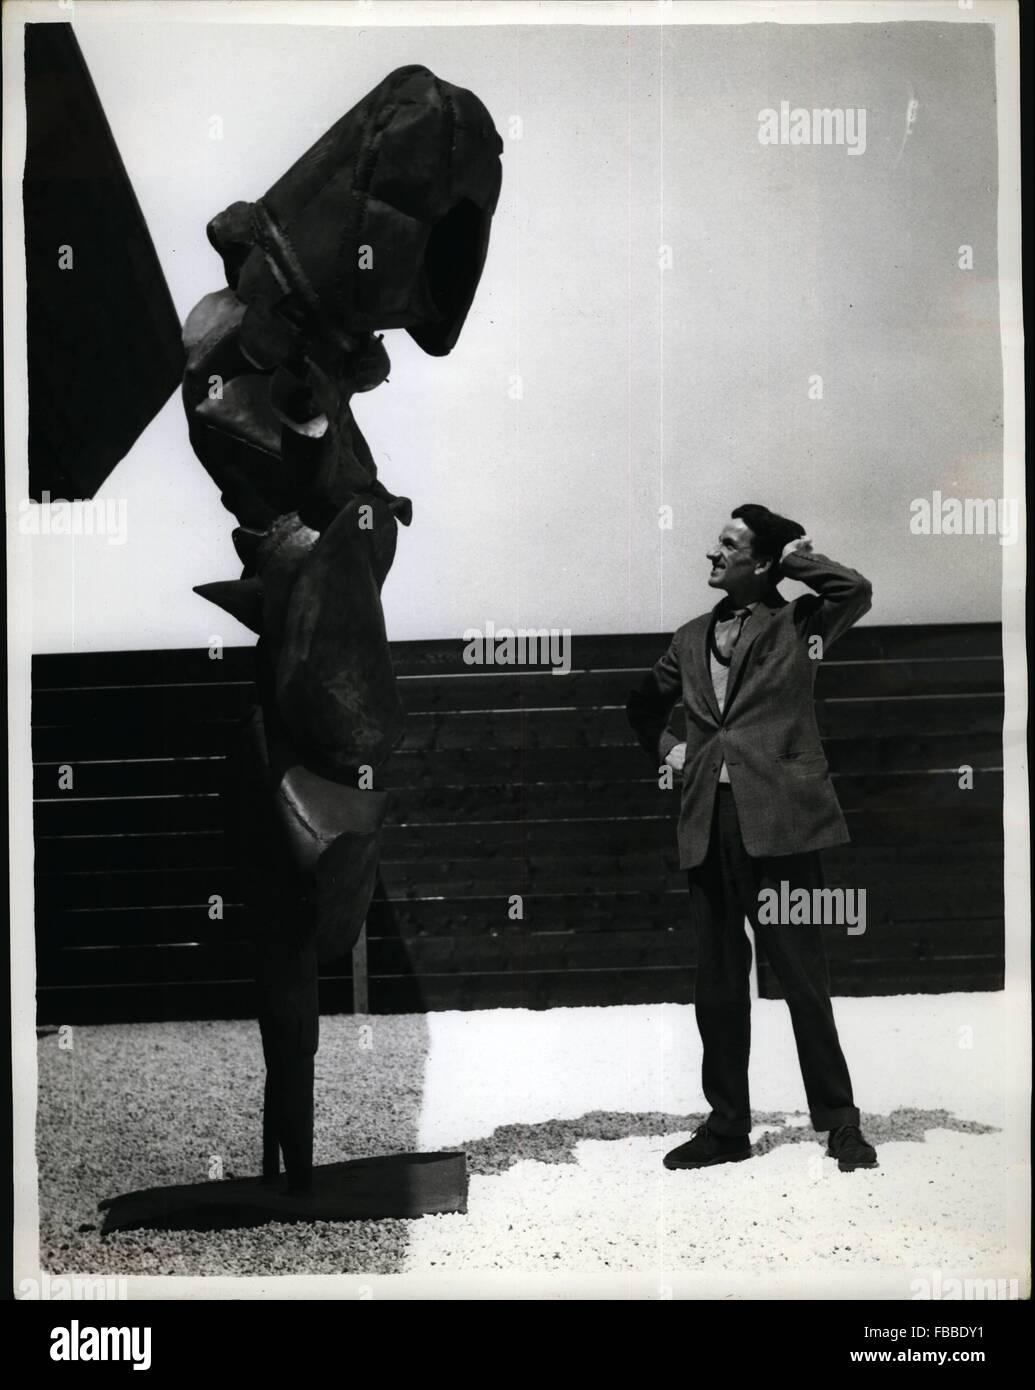 Usa 1955 Stockfotos & Usa 1955 Bilder - Seite 18 - Alamy